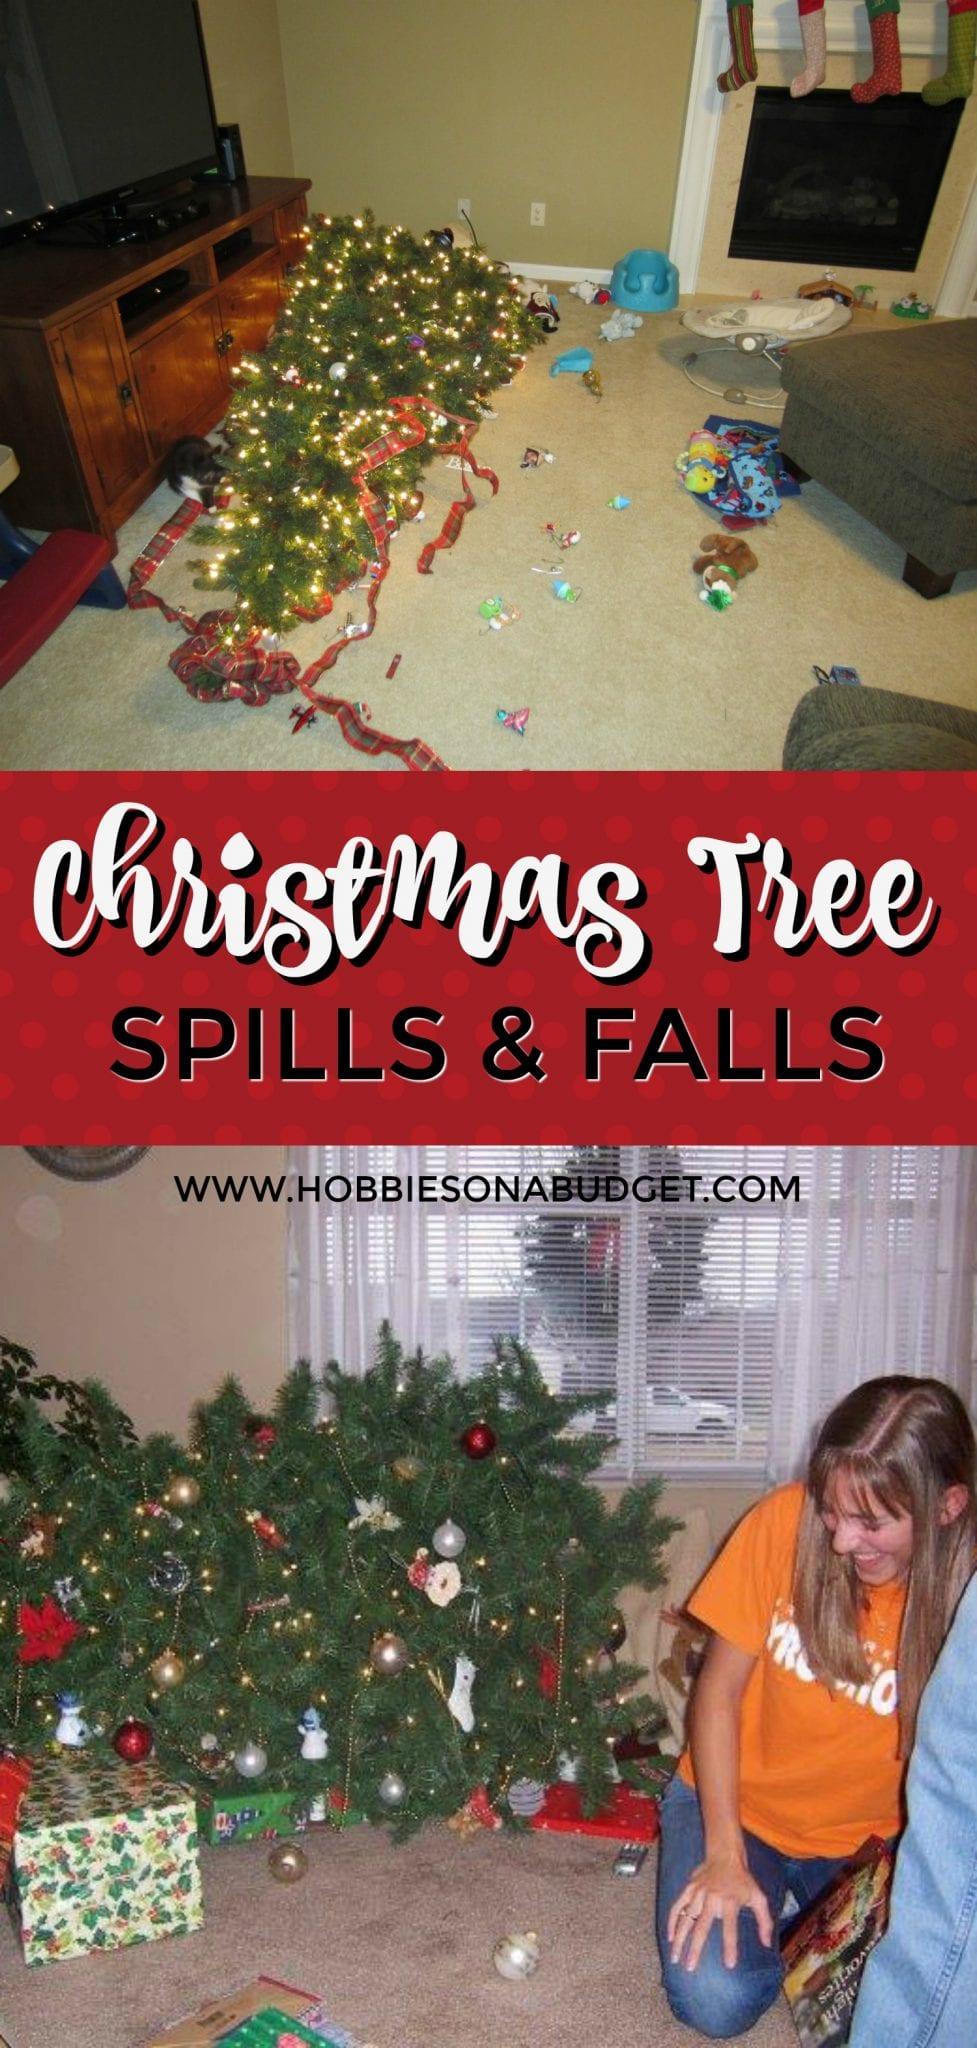 CHRISTMAS TREE SPILLS AND FALLS